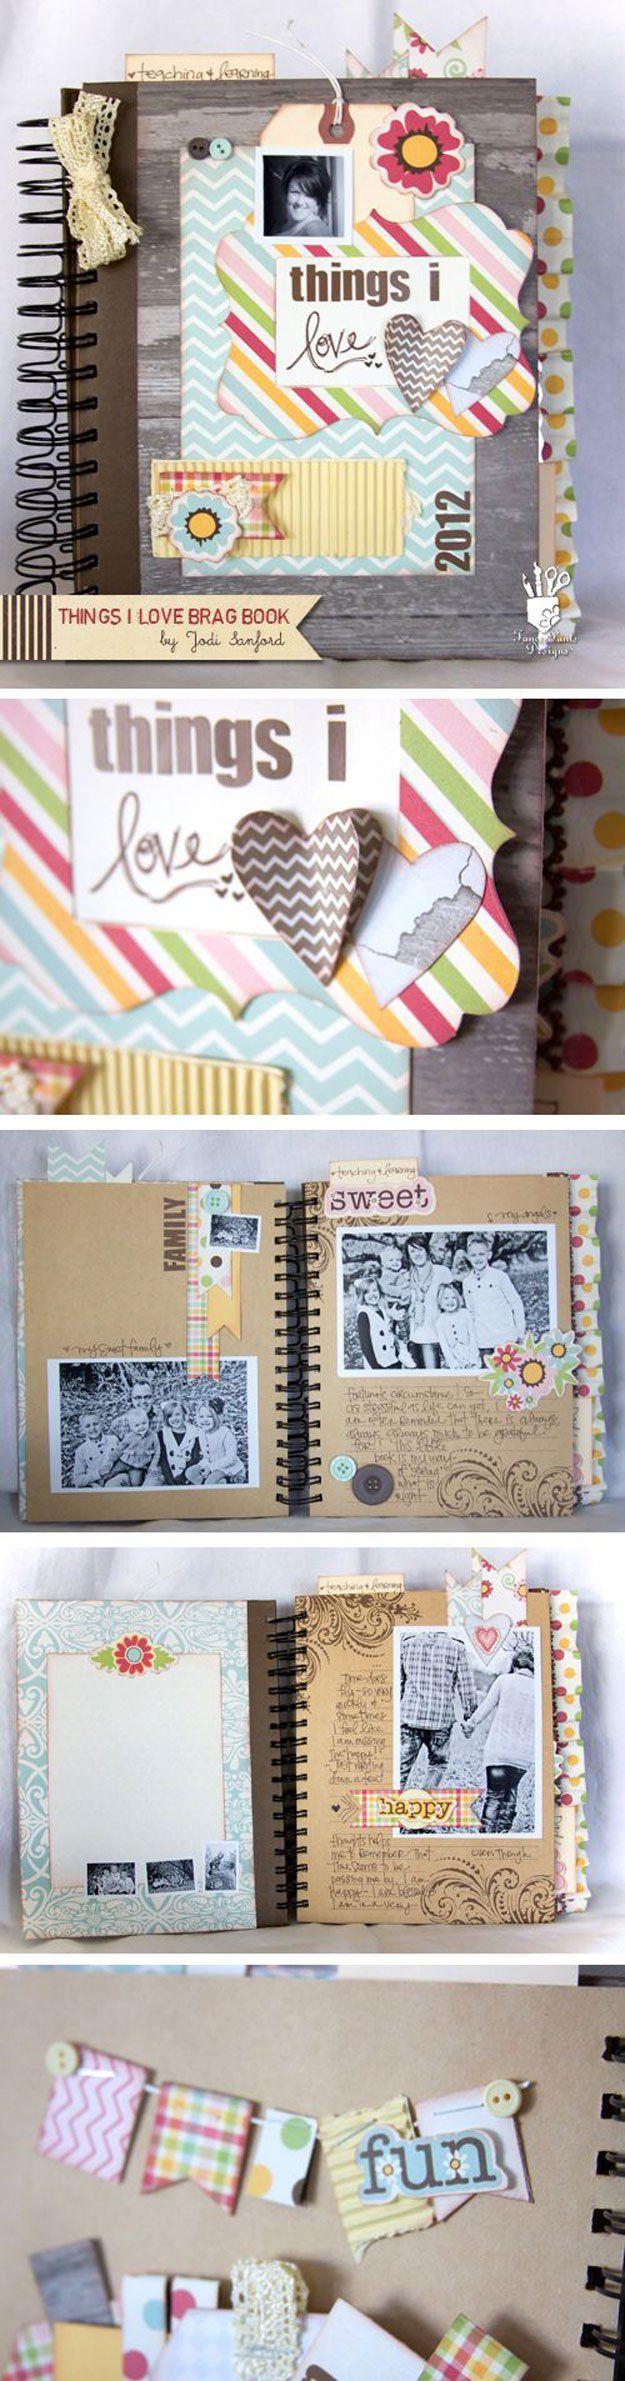 Scrapbook Ideas for Beginners | http://diyready.com/cool-scrapbook-ideas-you-should-make/